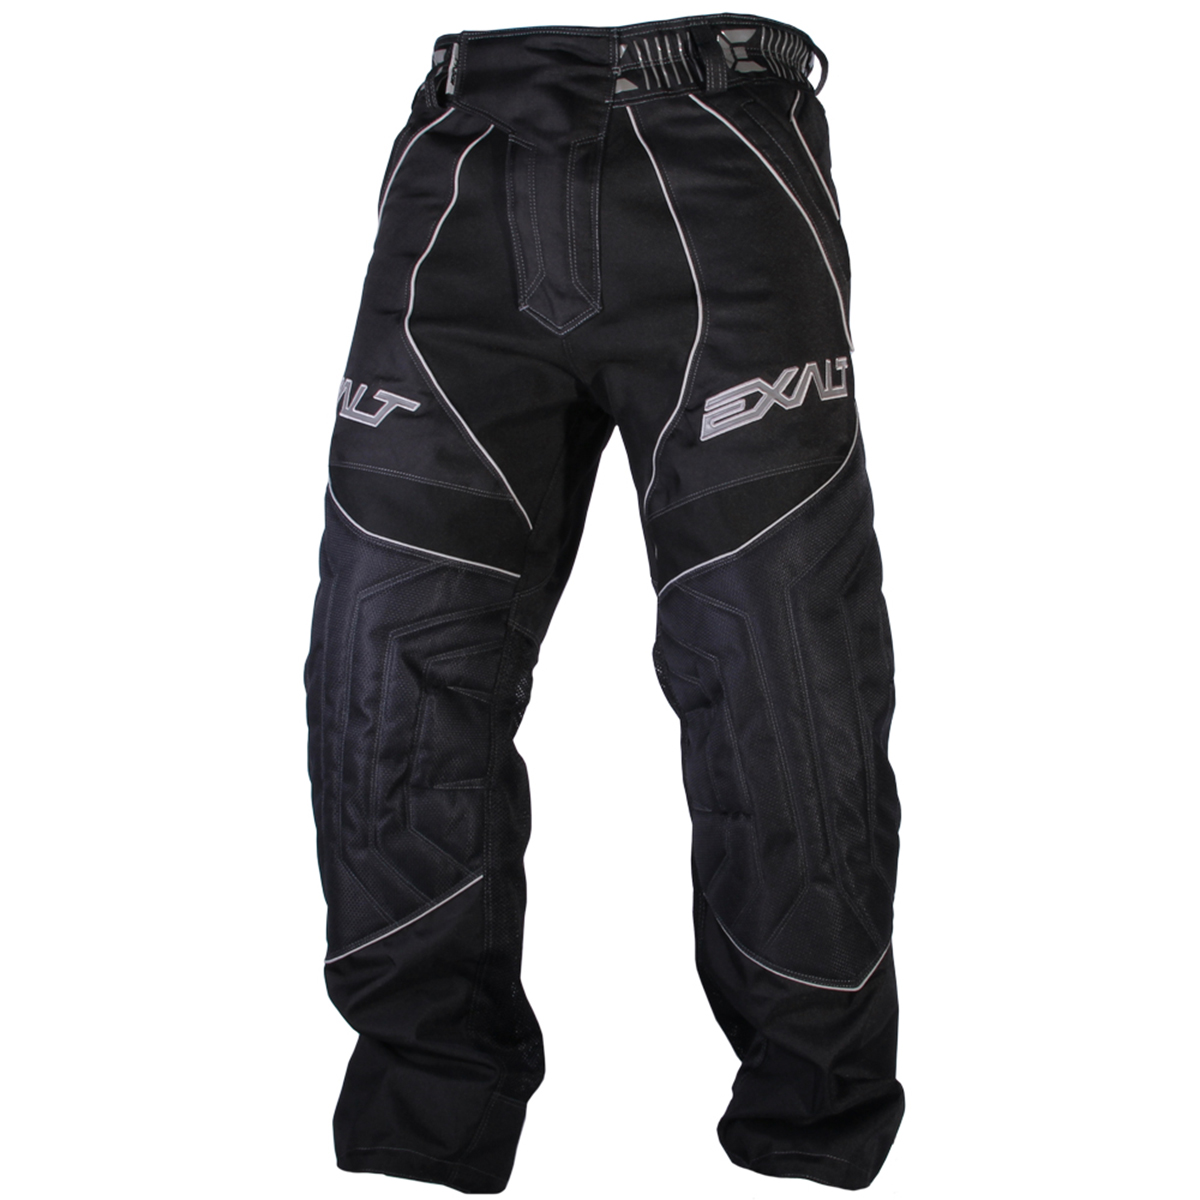 Exalt Paintball T4 Pants - Black